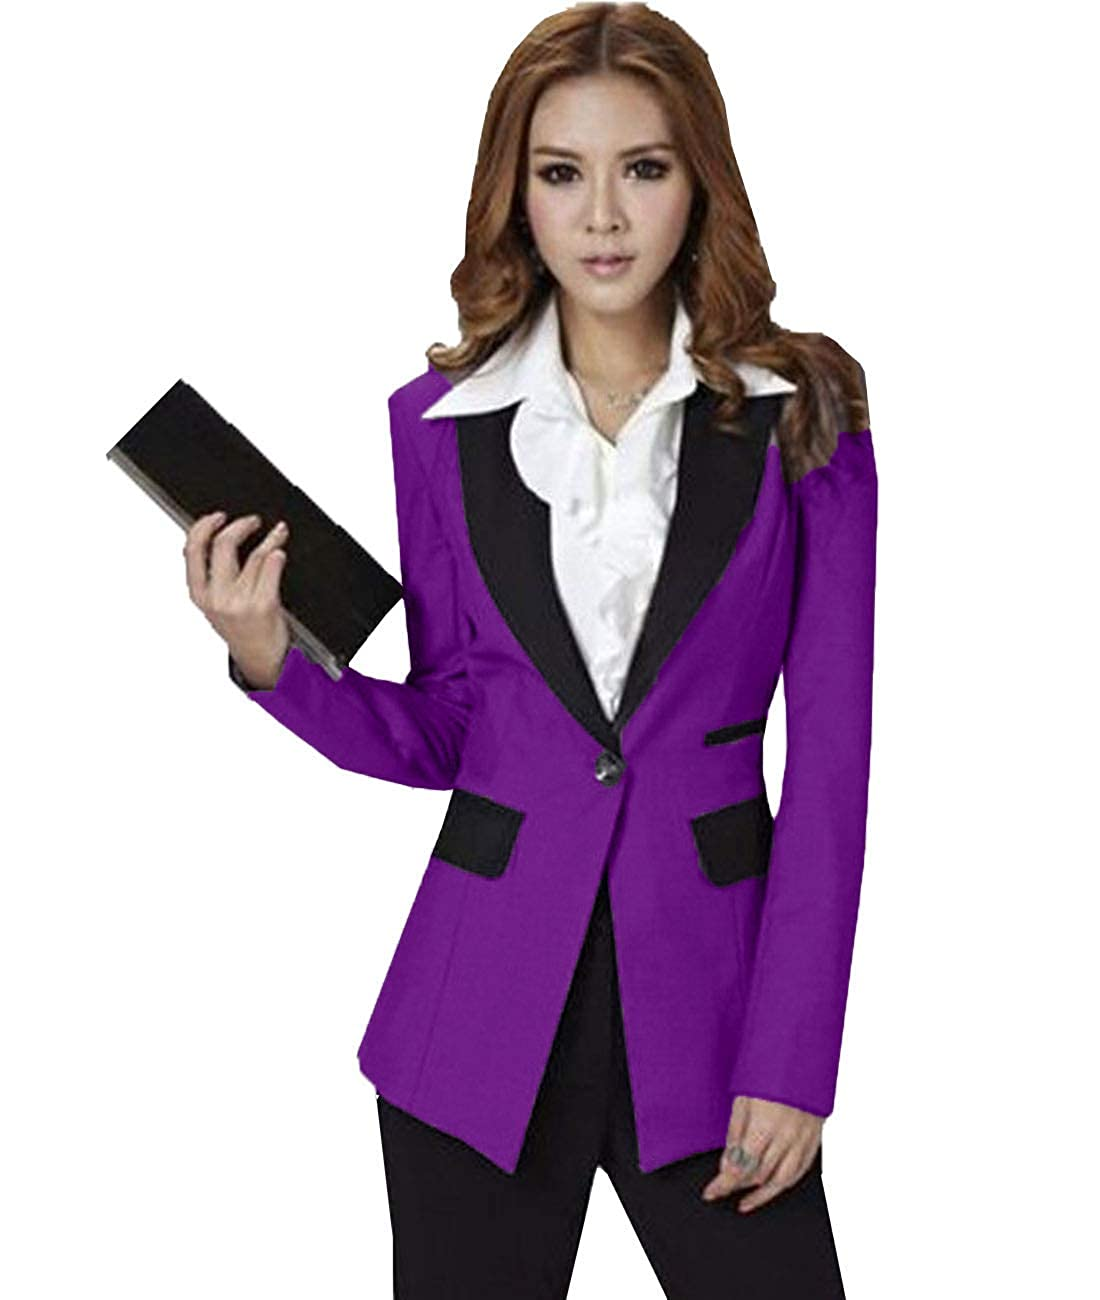 YSMO Frauen Slim Fit 2 St/ück Anzug Langarm Hose mit Jacke Anzug Set Business Work Blazer